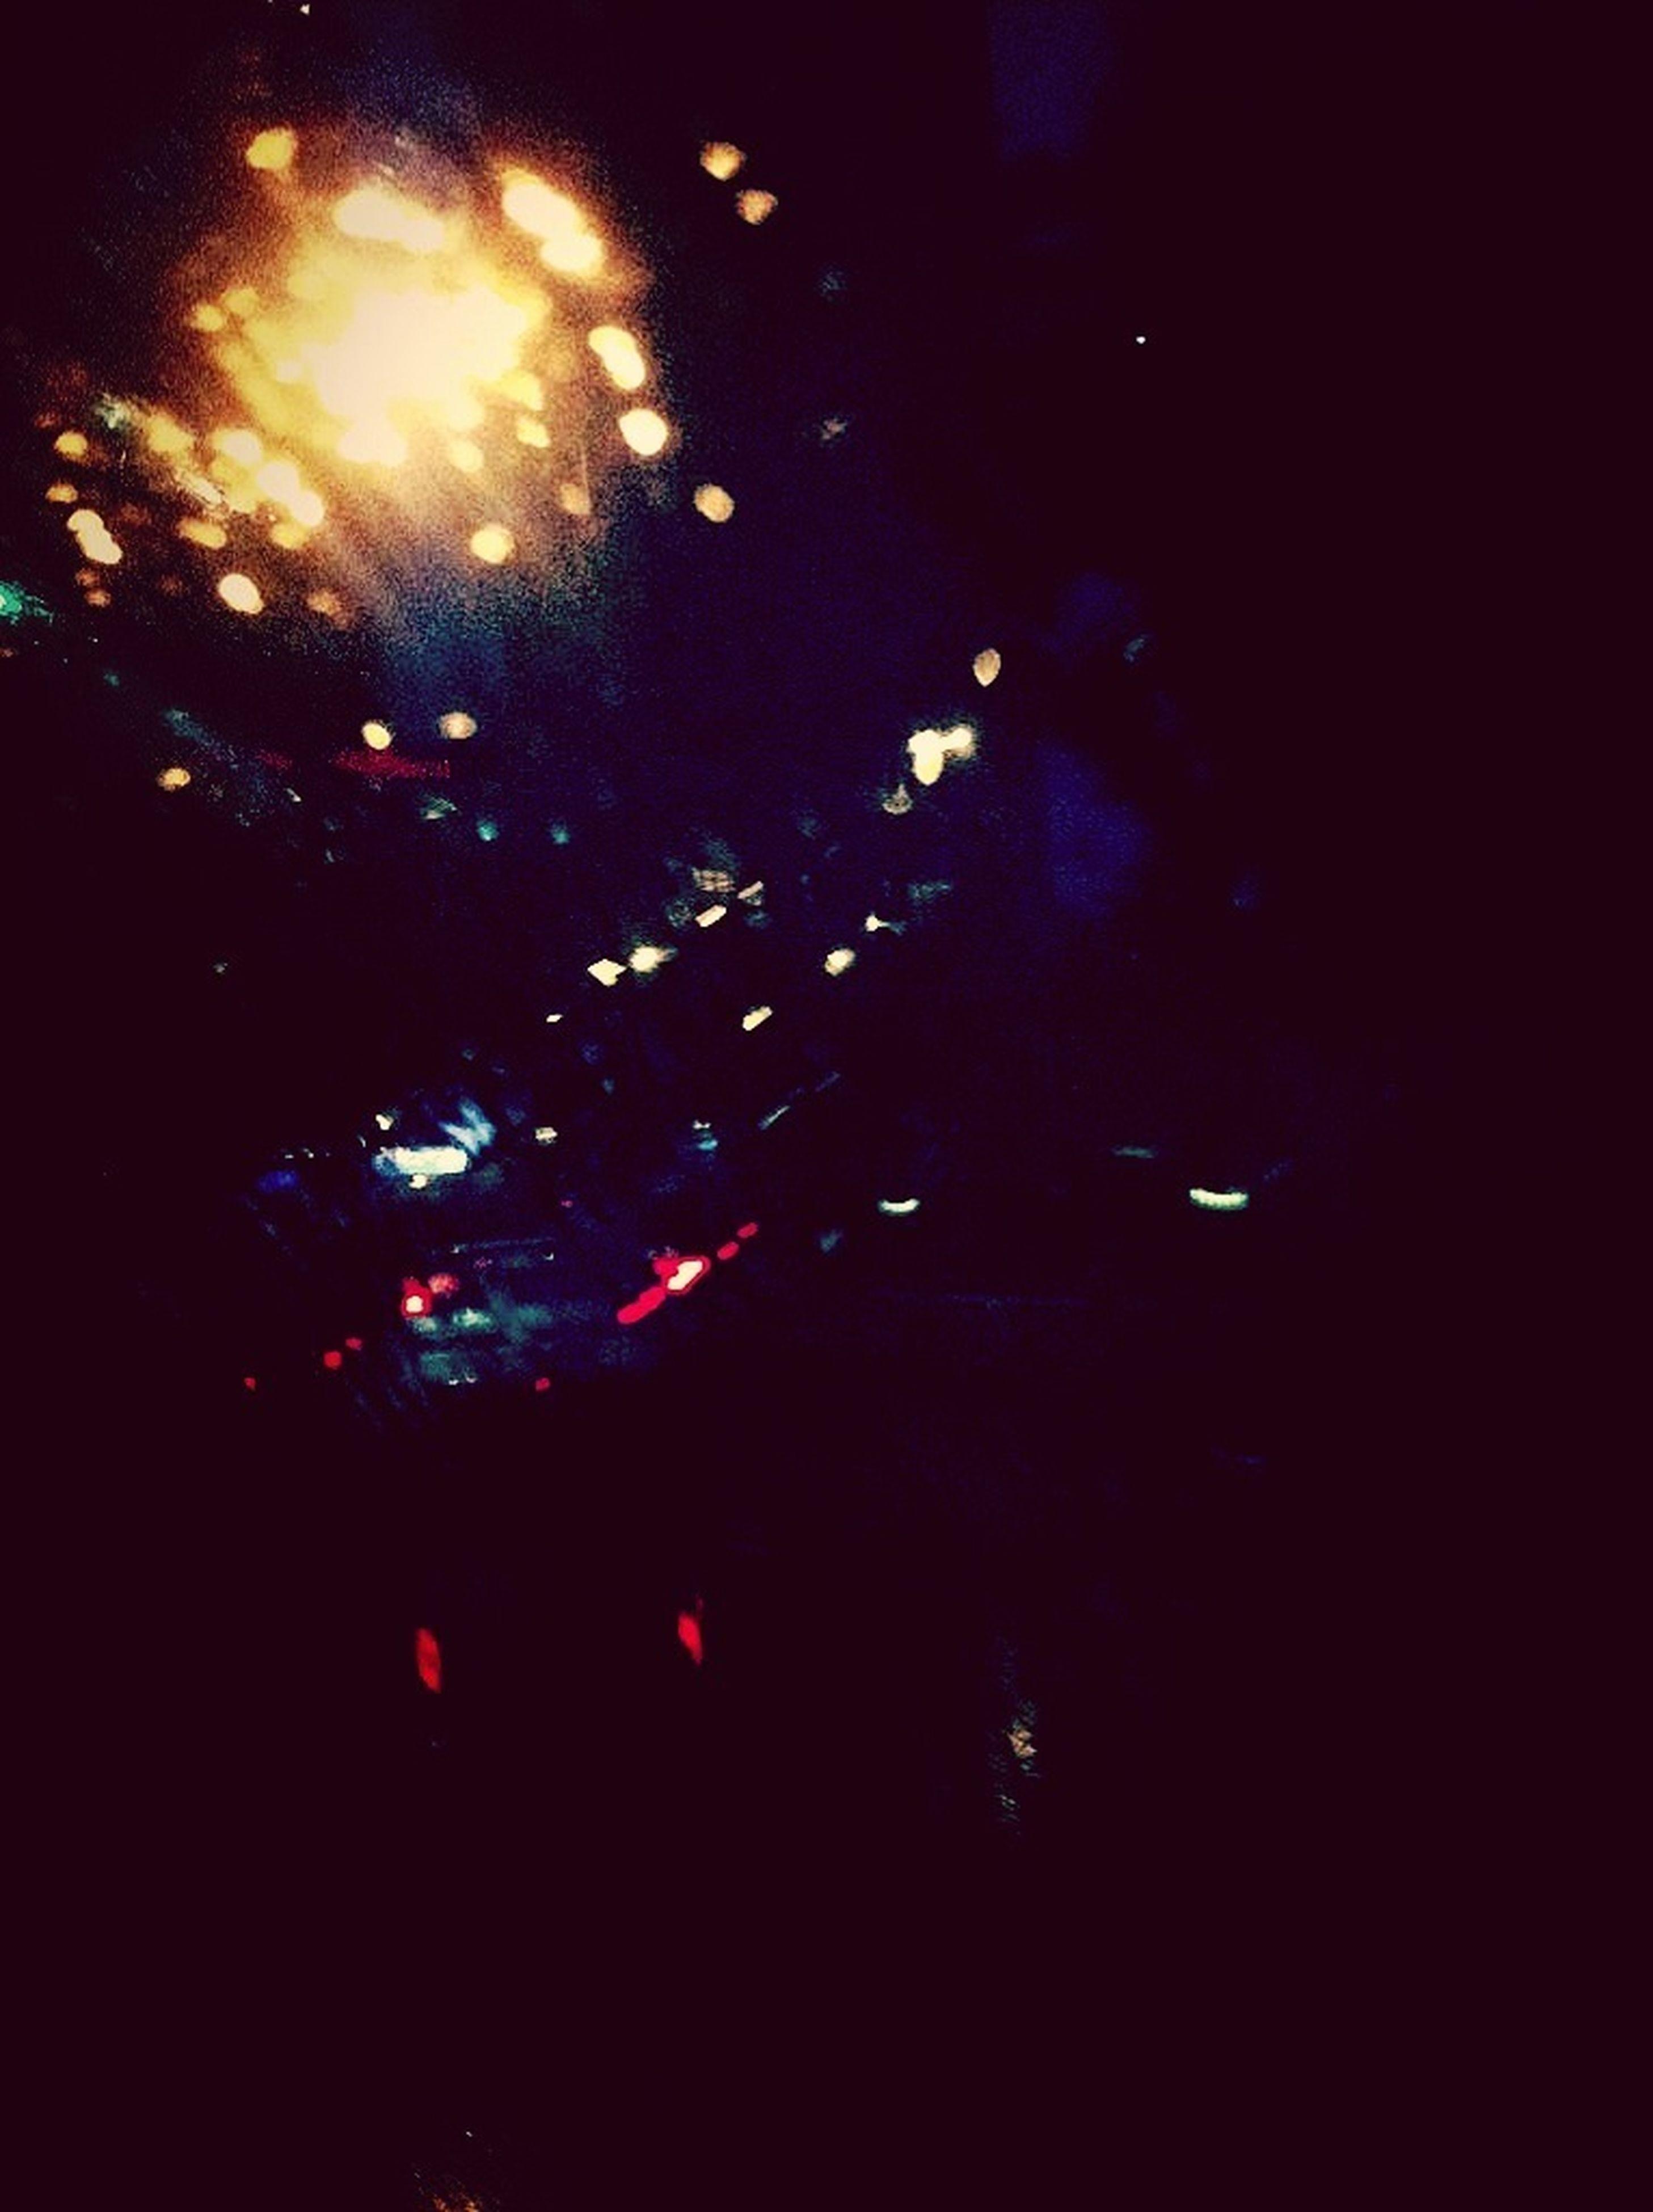 night, illuminated, dark, light - natural phenomenon, lighting equipment, glowing, indoors, car, street, no people, celebration, glass - material, motion, transparent, street light, light, multi colored, nightlife, window